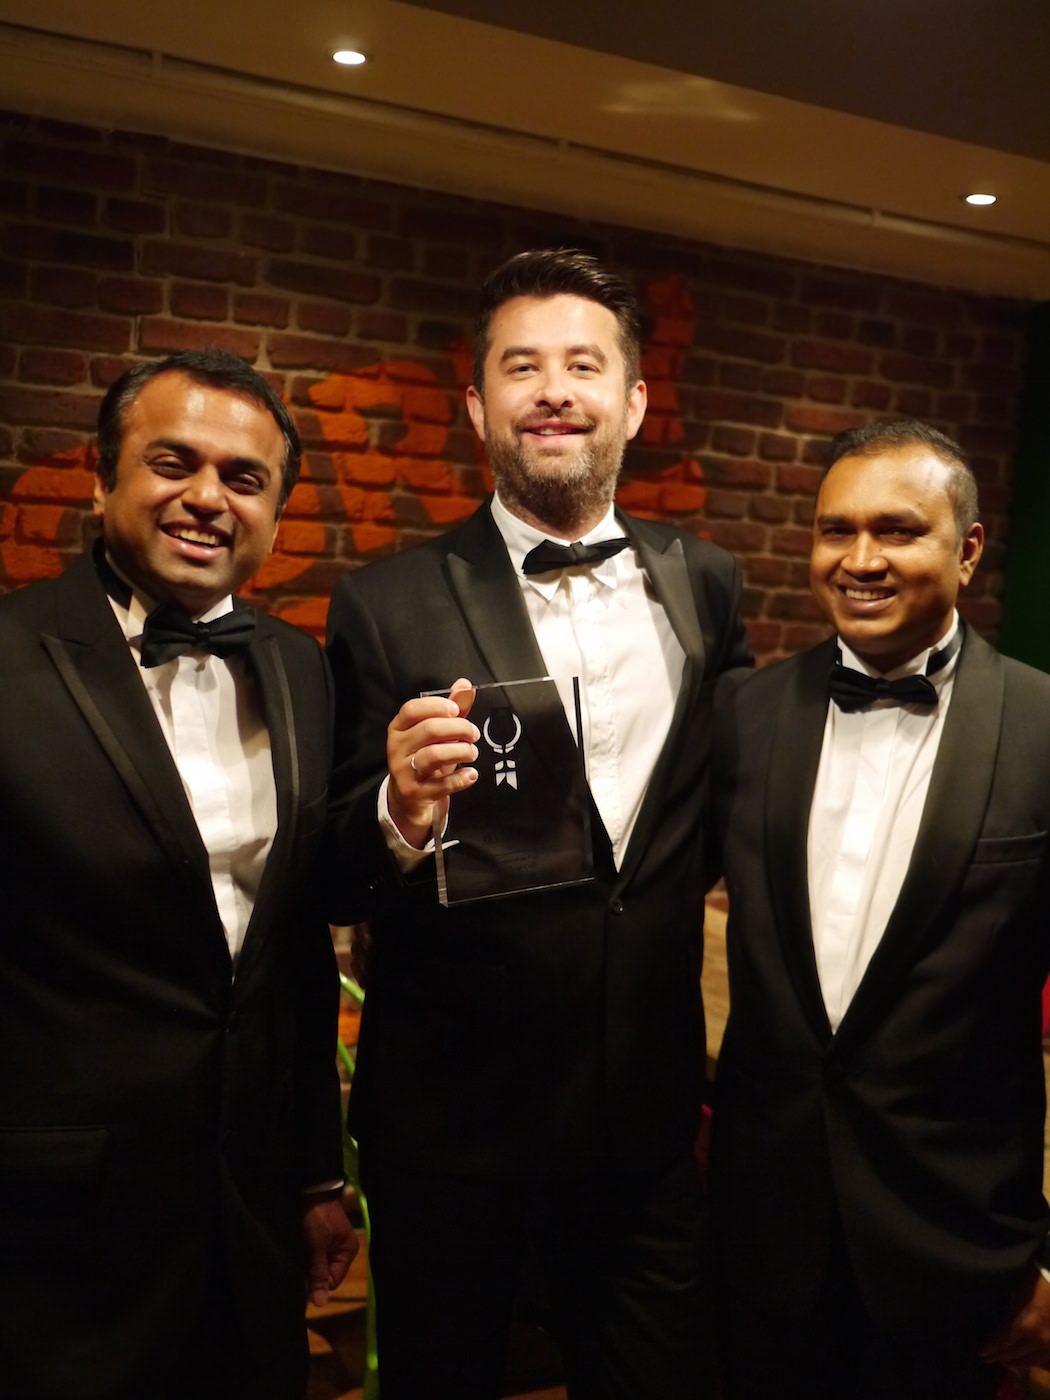 (L to R): Co-owners Kanthi Thamma & Euan Sey, plus Head Chef Gouranga Bera pose with the award